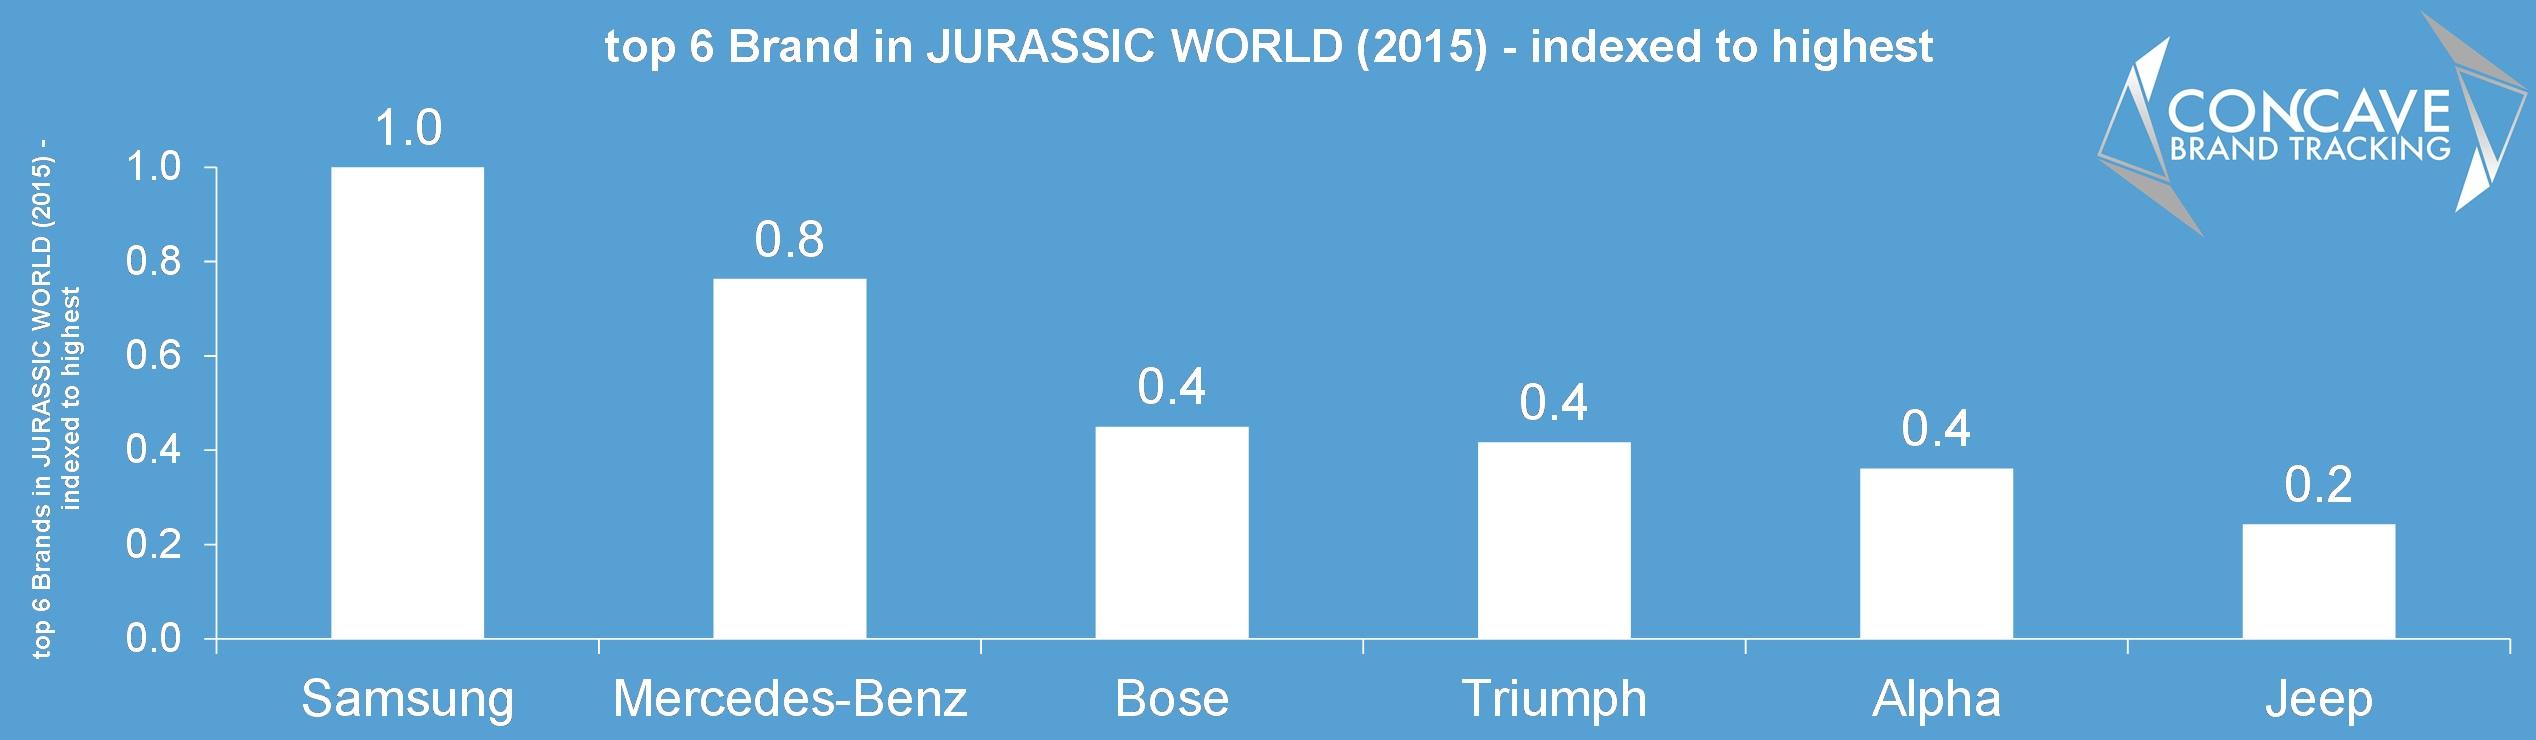 top 6 brands in jurassic world